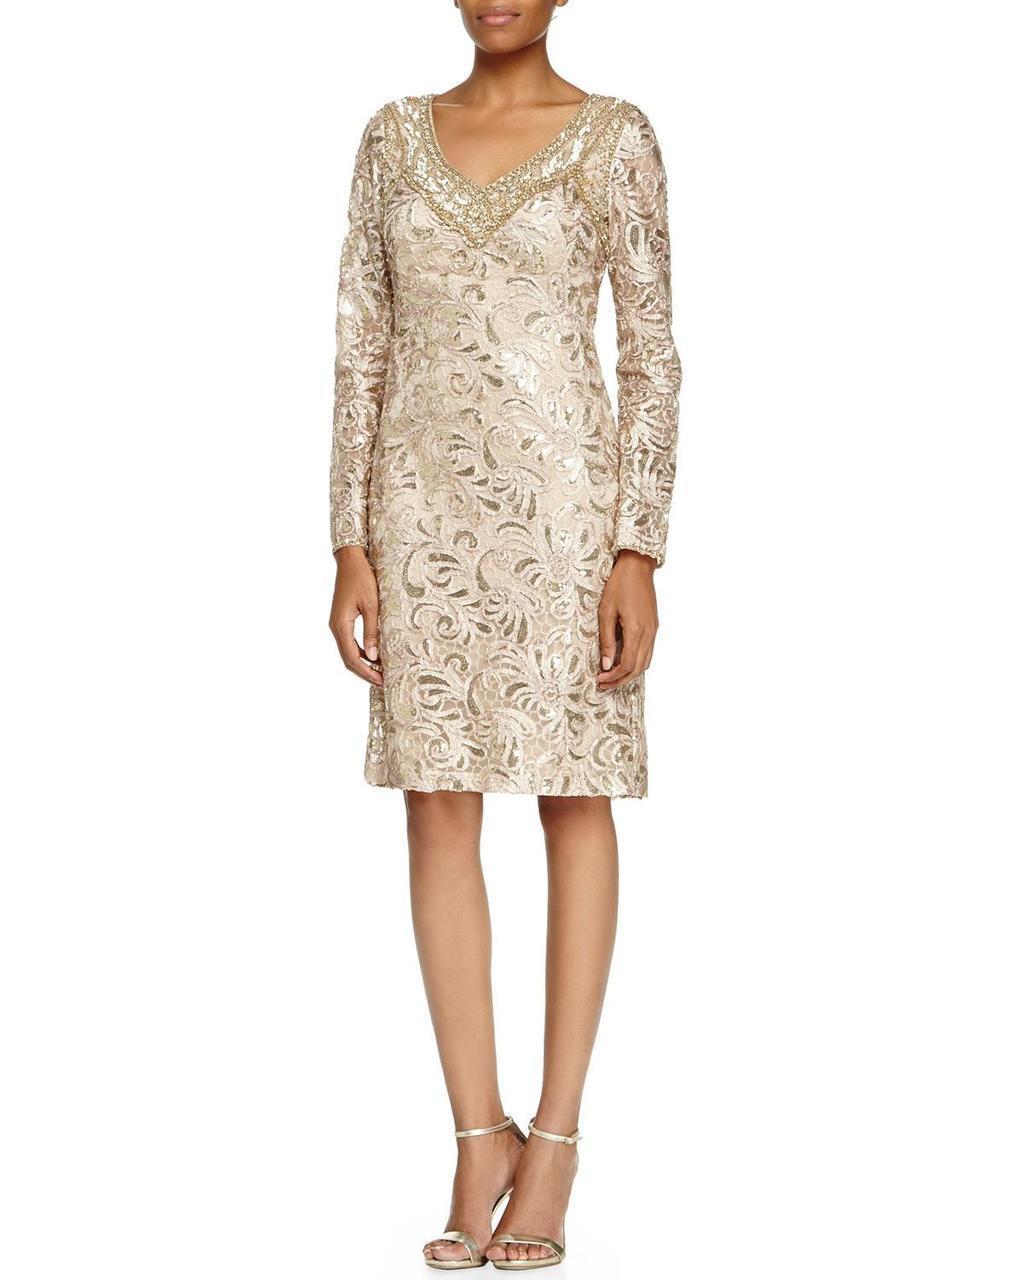 Sue Wong - Sequined Paisley Sheath Dress N5115